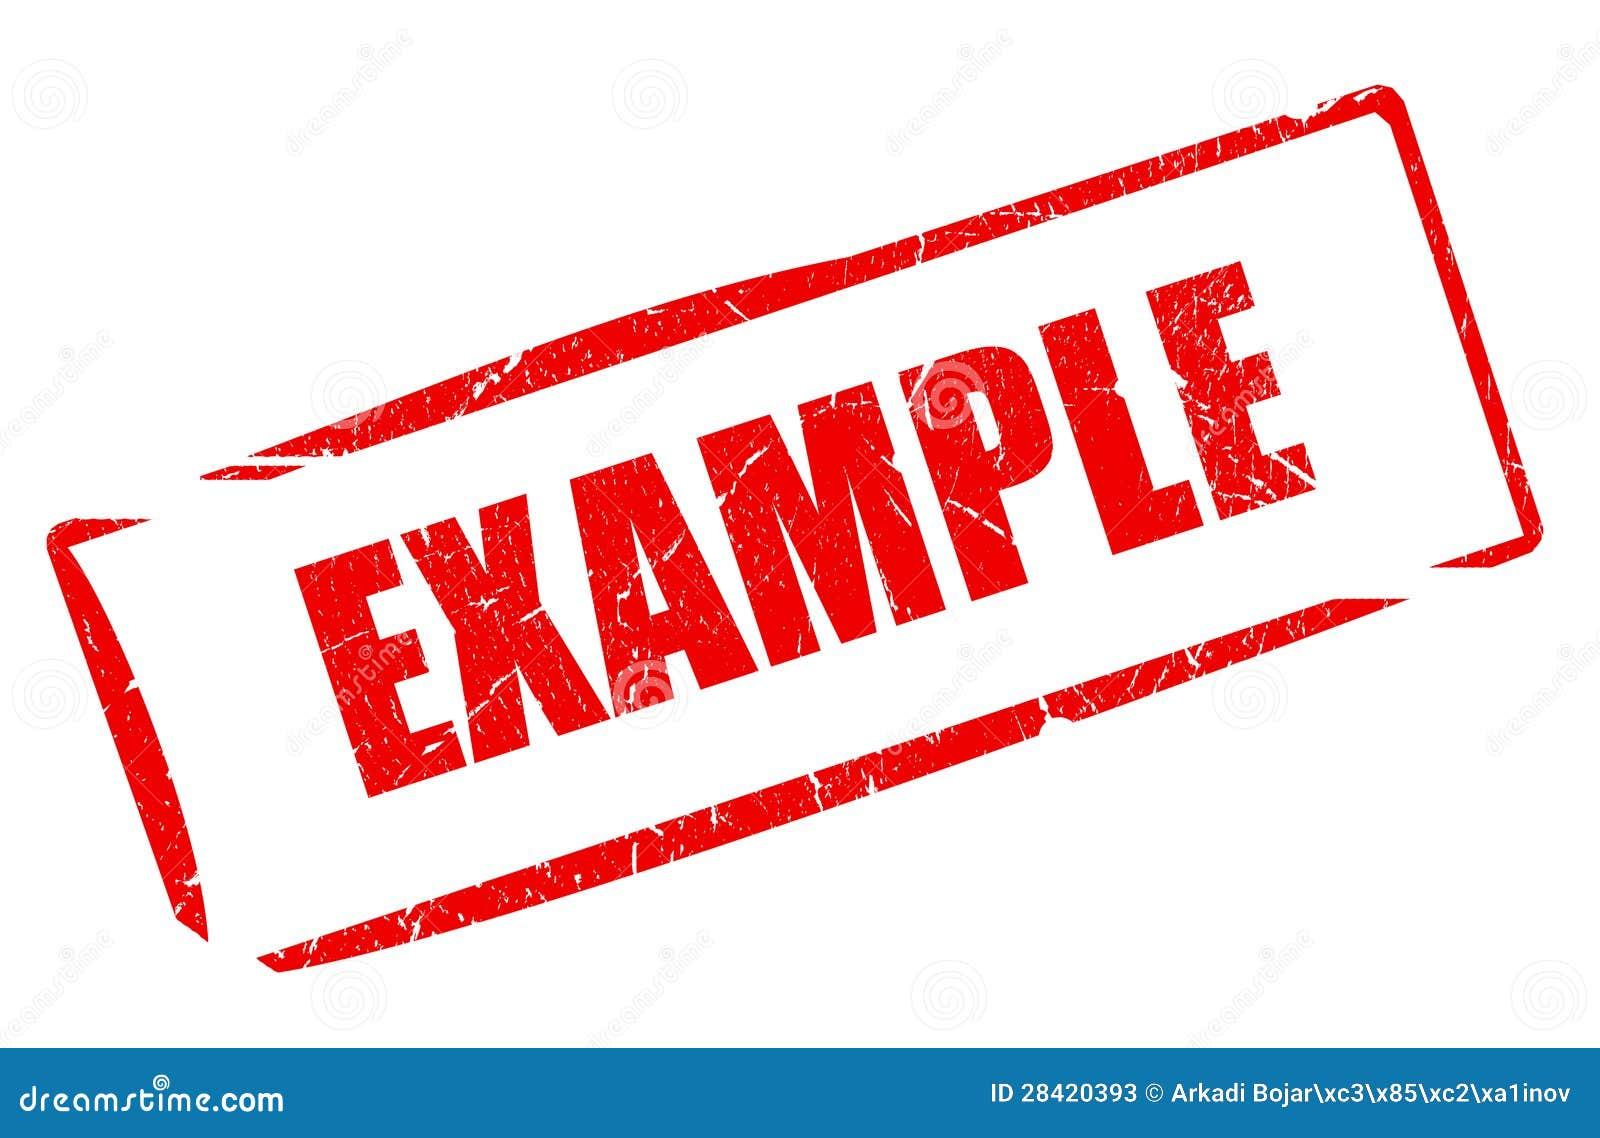 example stamp stock illustration. illustration of caution - 28420393